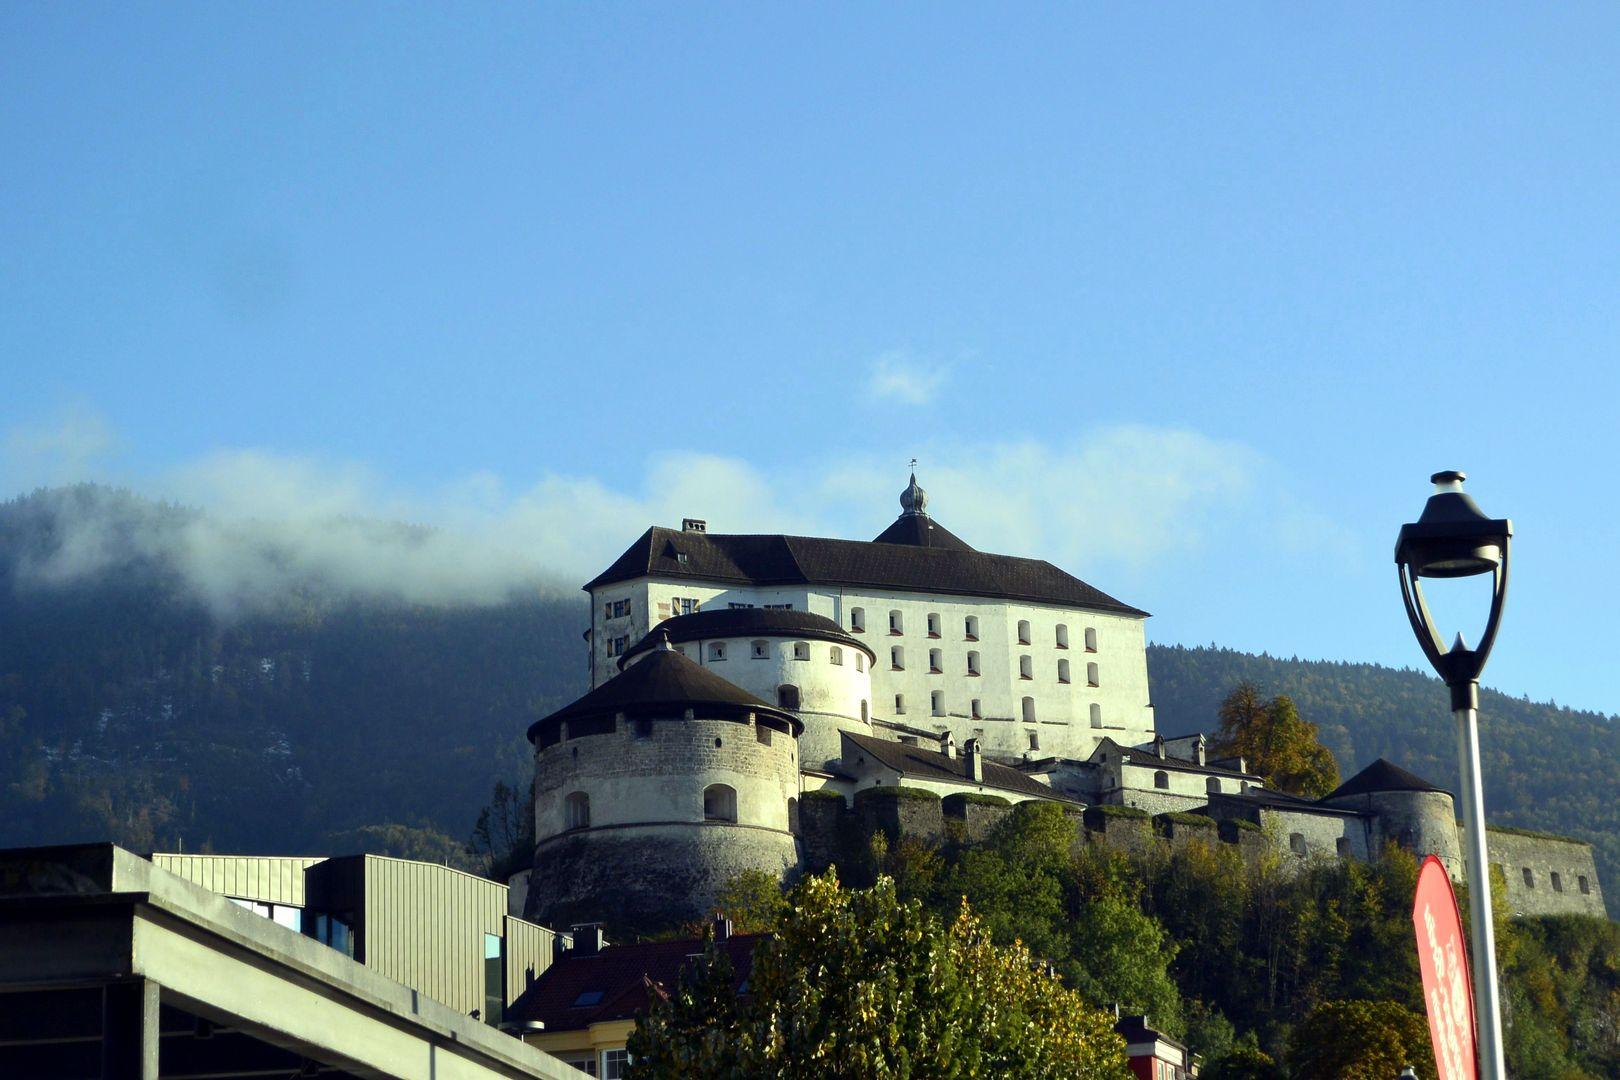 Nikon 1 V2 - 30mm Festung Kufstein